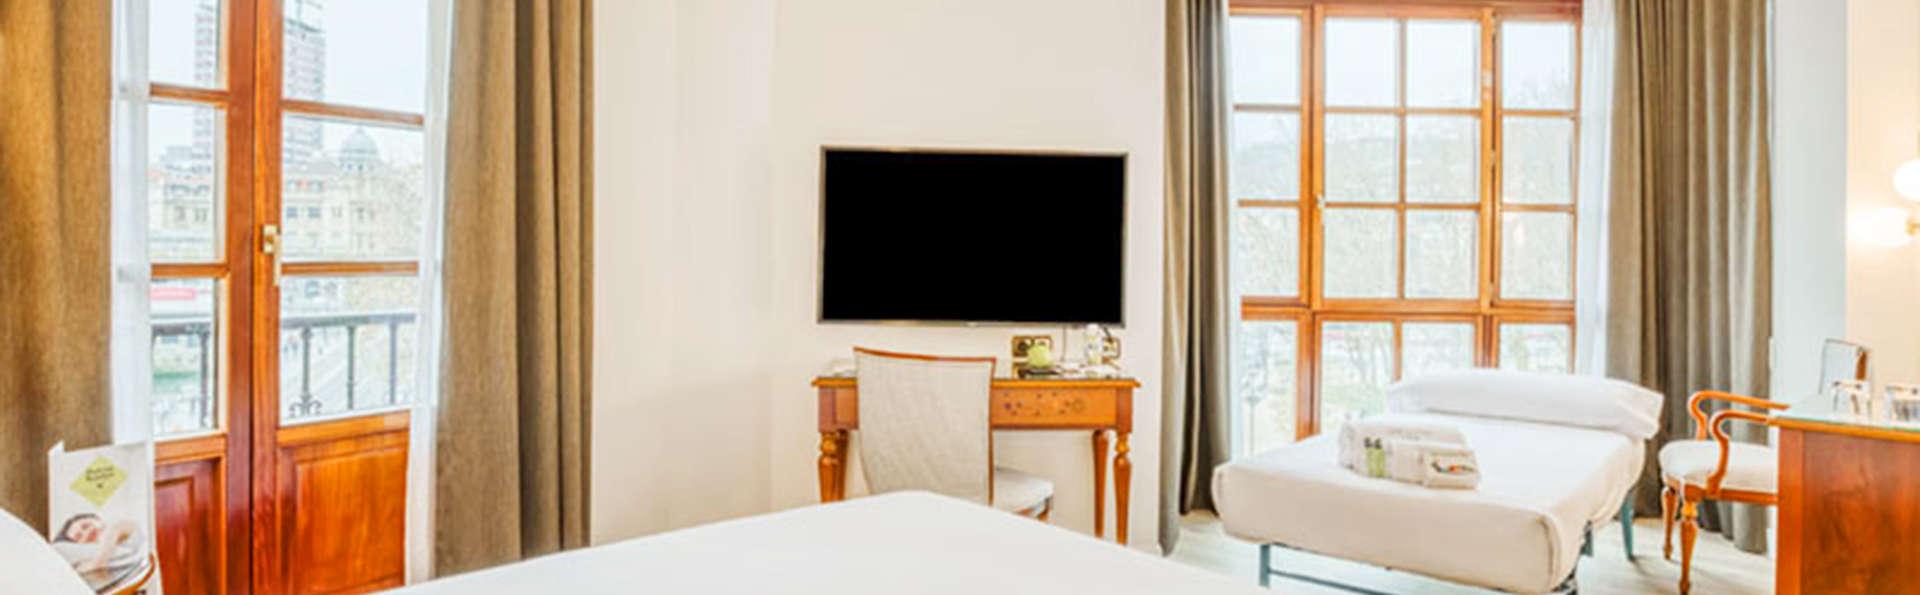 Hotel Arenal Bilbao - EDIT_ROOM_.jpg